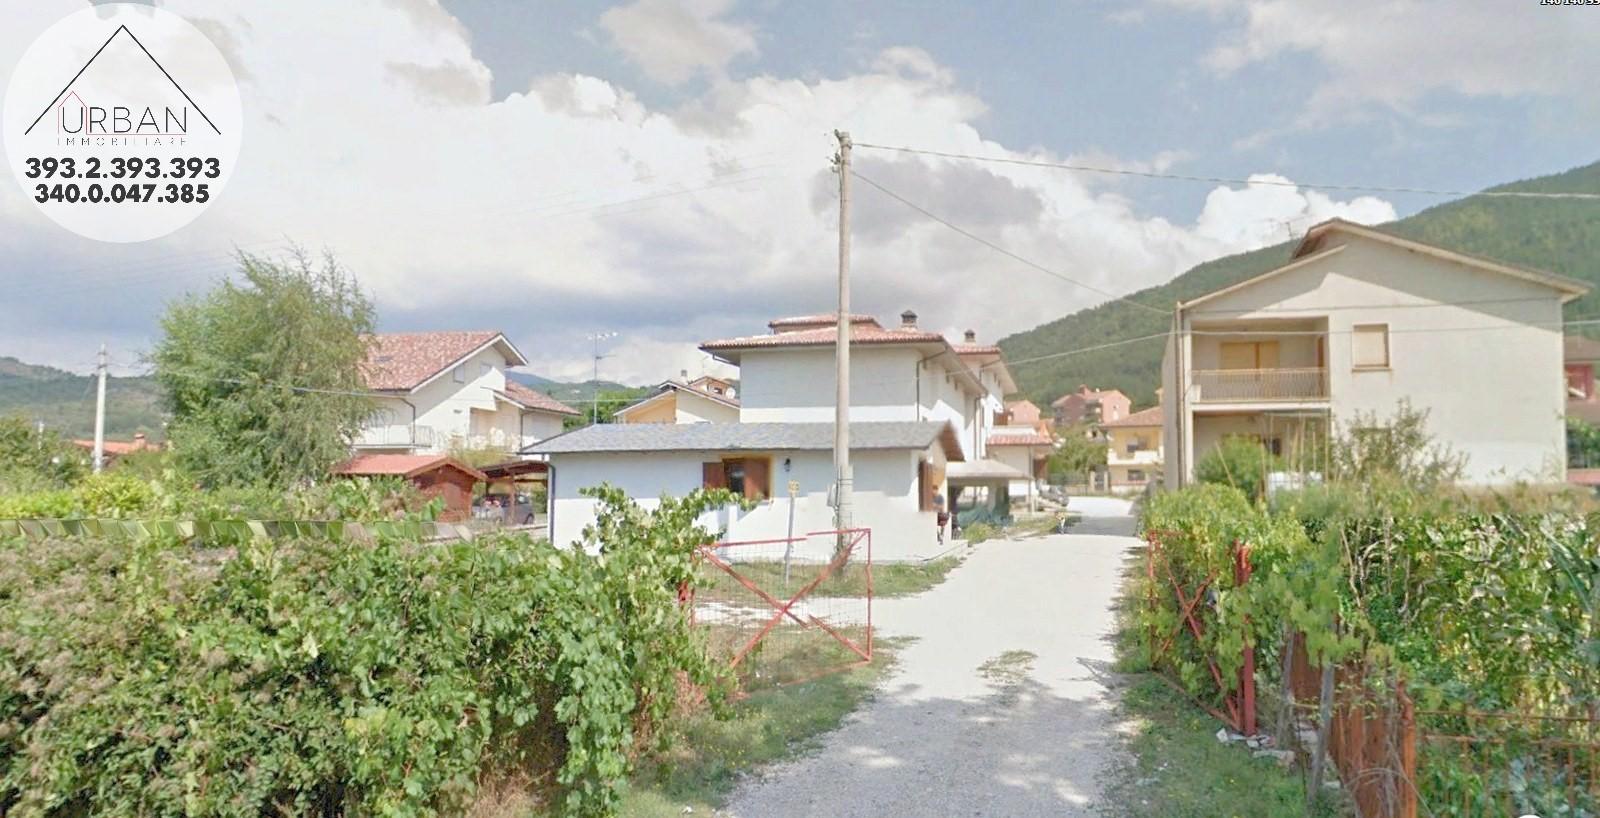 Vendita Villa a LAquila AQ Localit Cansatessa LAquila AQ  Strada Statale 80 Km 5